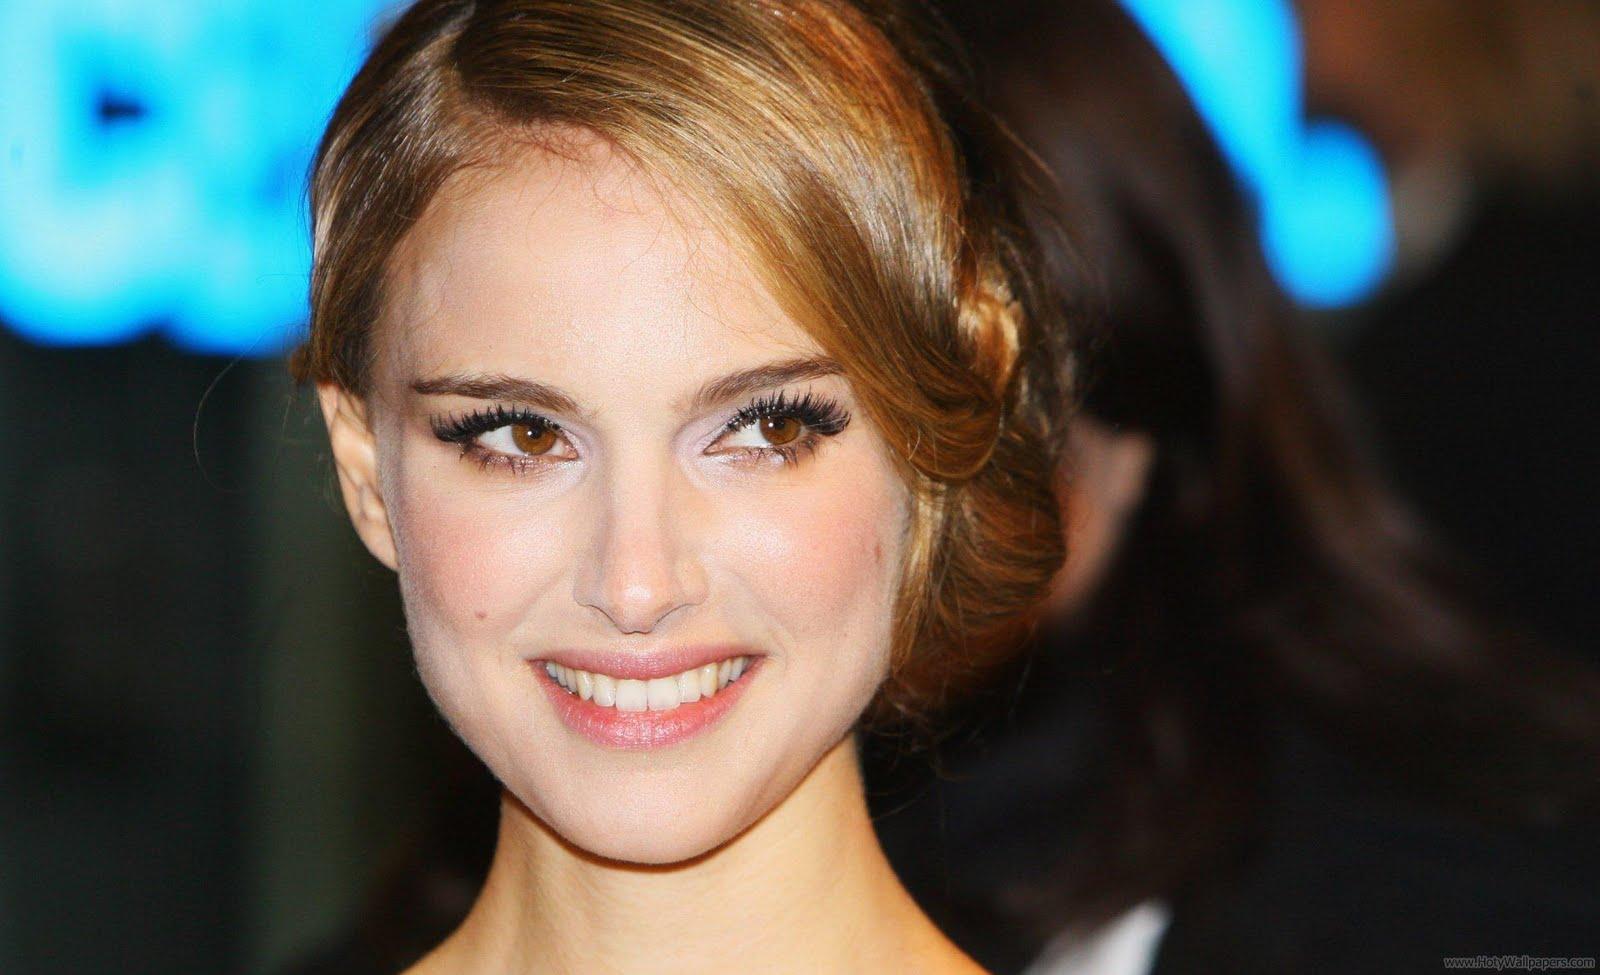 Natalie Portman Hollywood Wallpapers: Natalie Portman Bio & Wallpapers